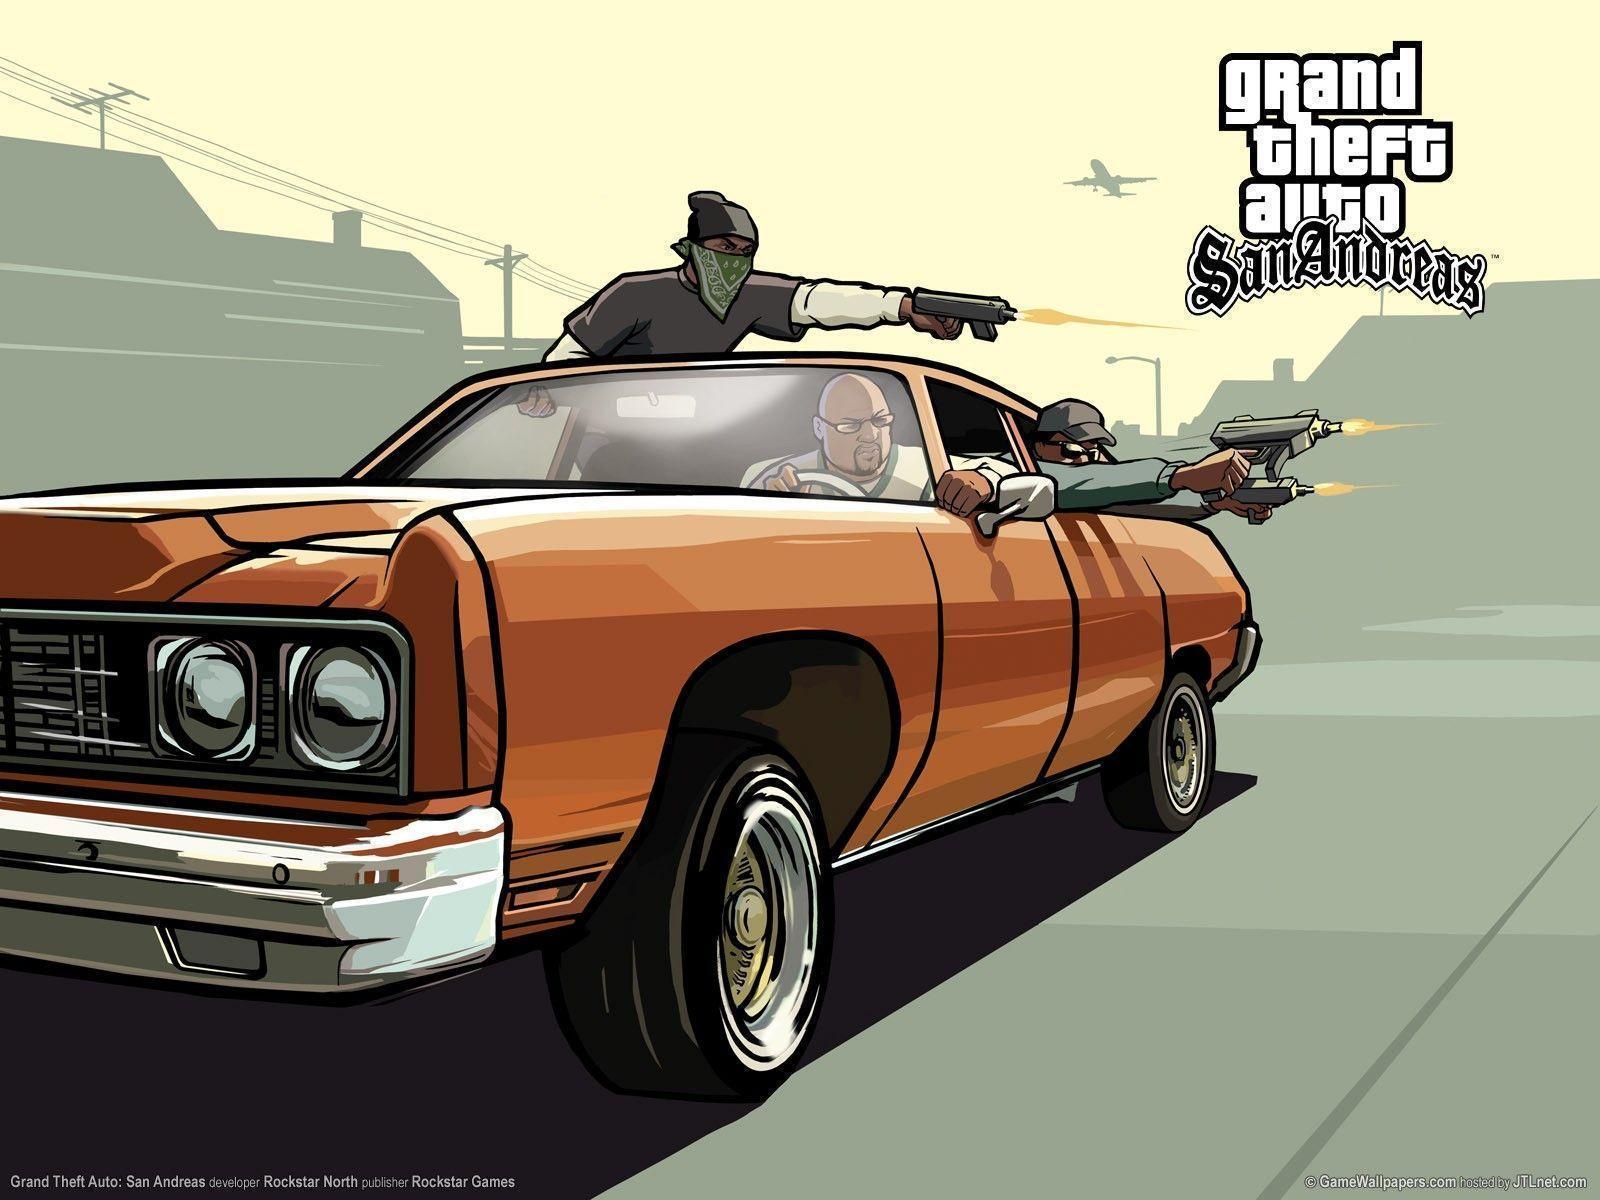 Wallpapers grand theft auto - Taringa!